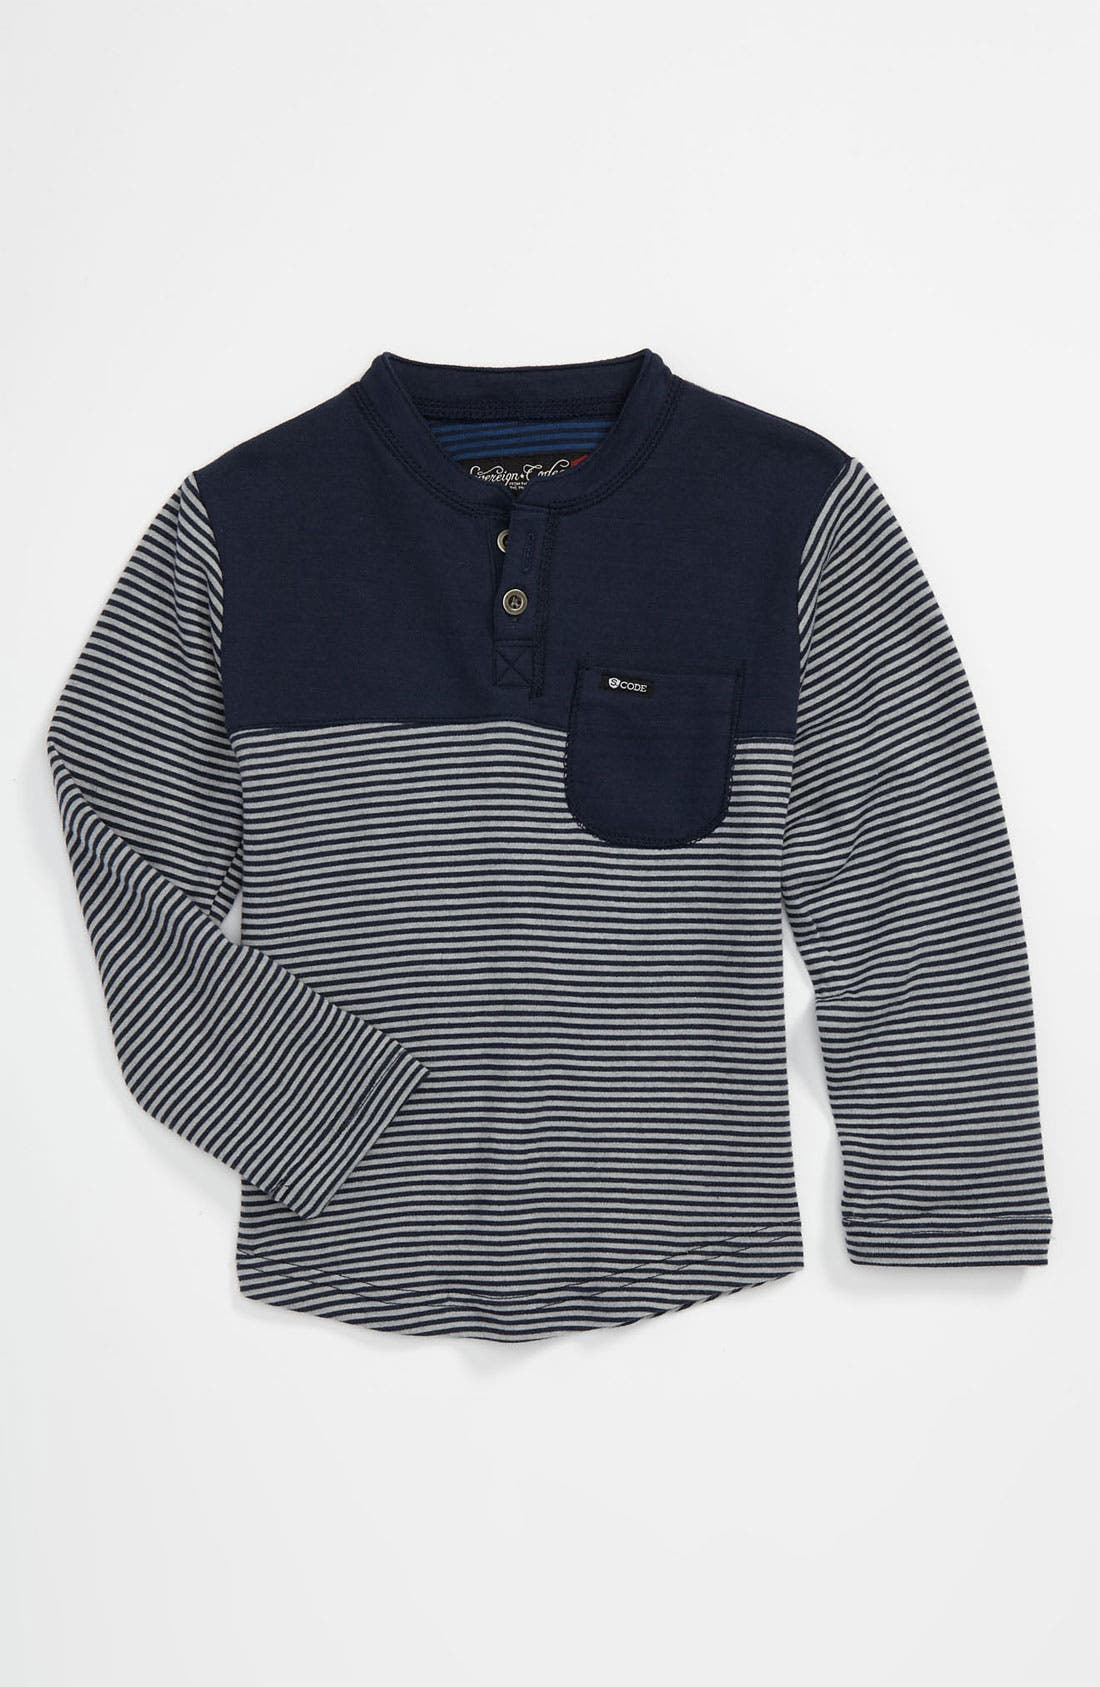 Main Image - Sovereign Code Henley Shirt (Toddler)